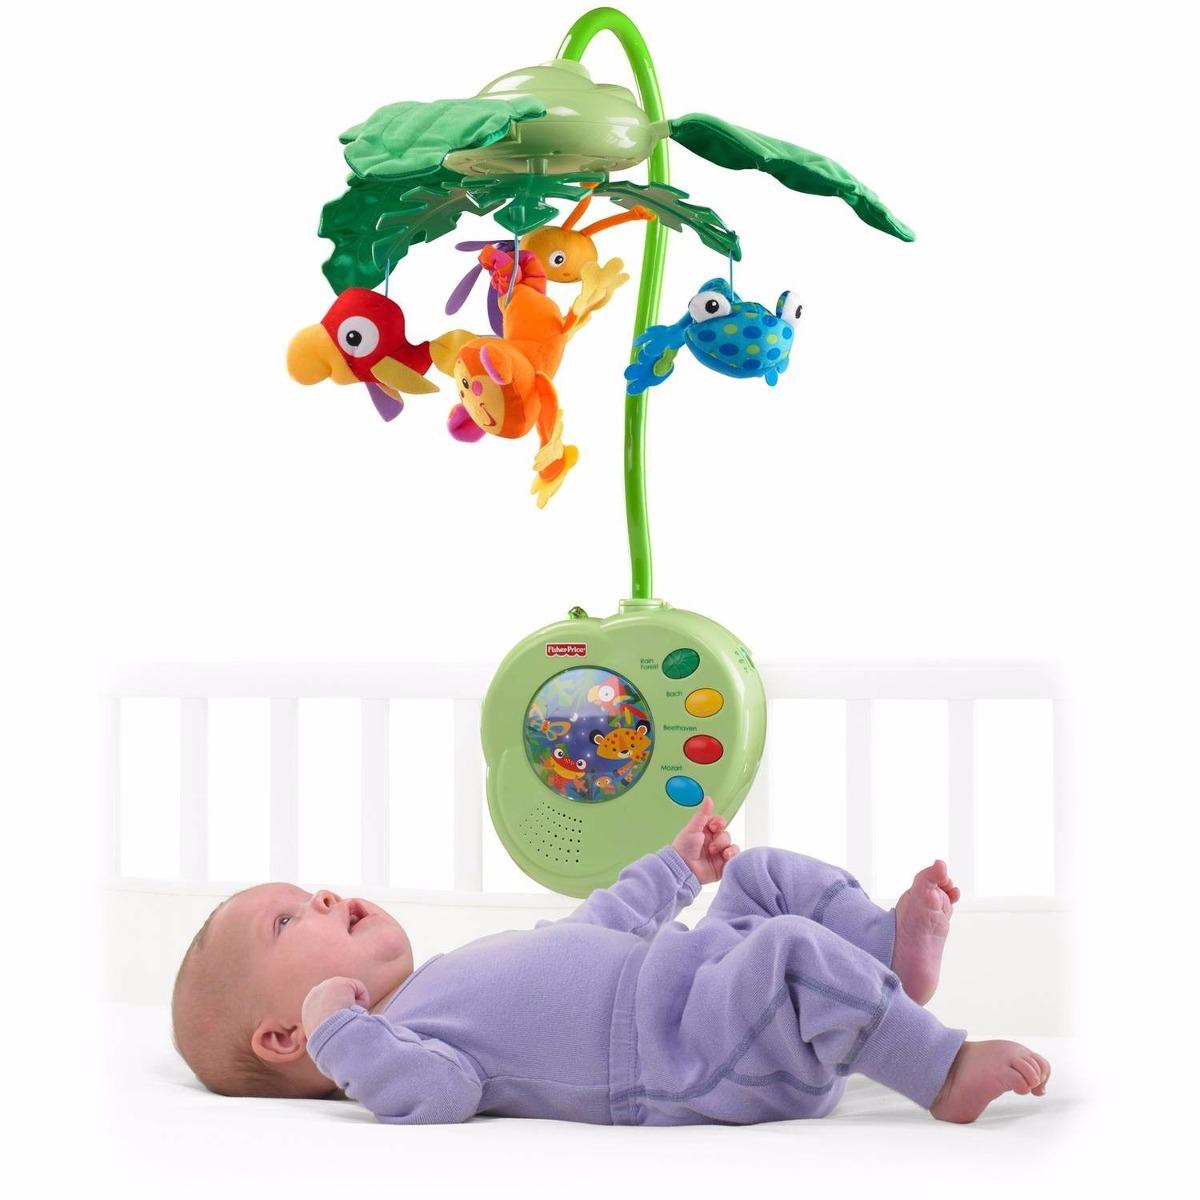 Movil para cuna bebe fisher price rainforest importado s 189 00 en mercado libre - Movil para cuna bebe ...